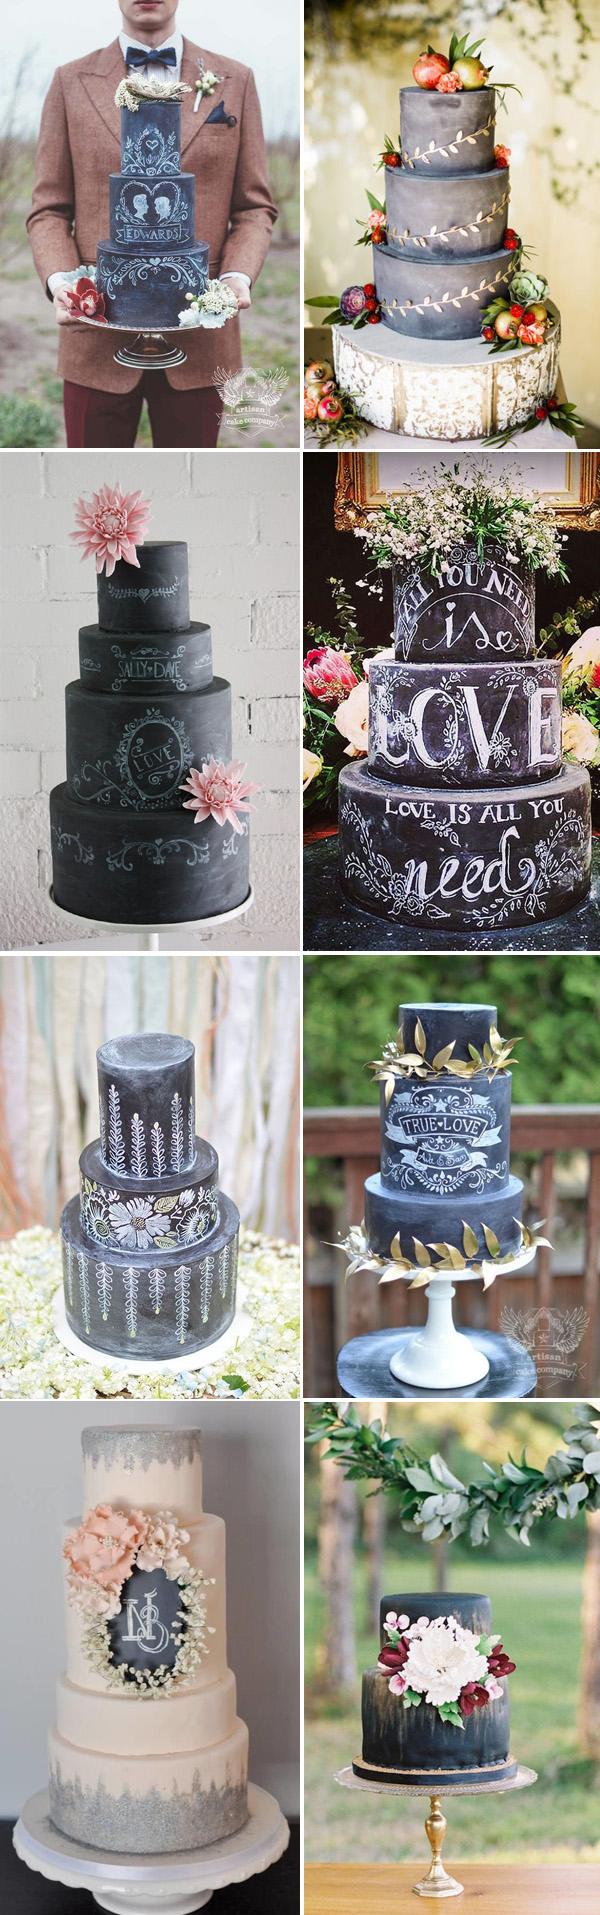 58 creative wedding cake ideas with tips wedding cakes ideas Rustic Wedding Cake Ideas Black and White Chalkboard Wedding Cakes